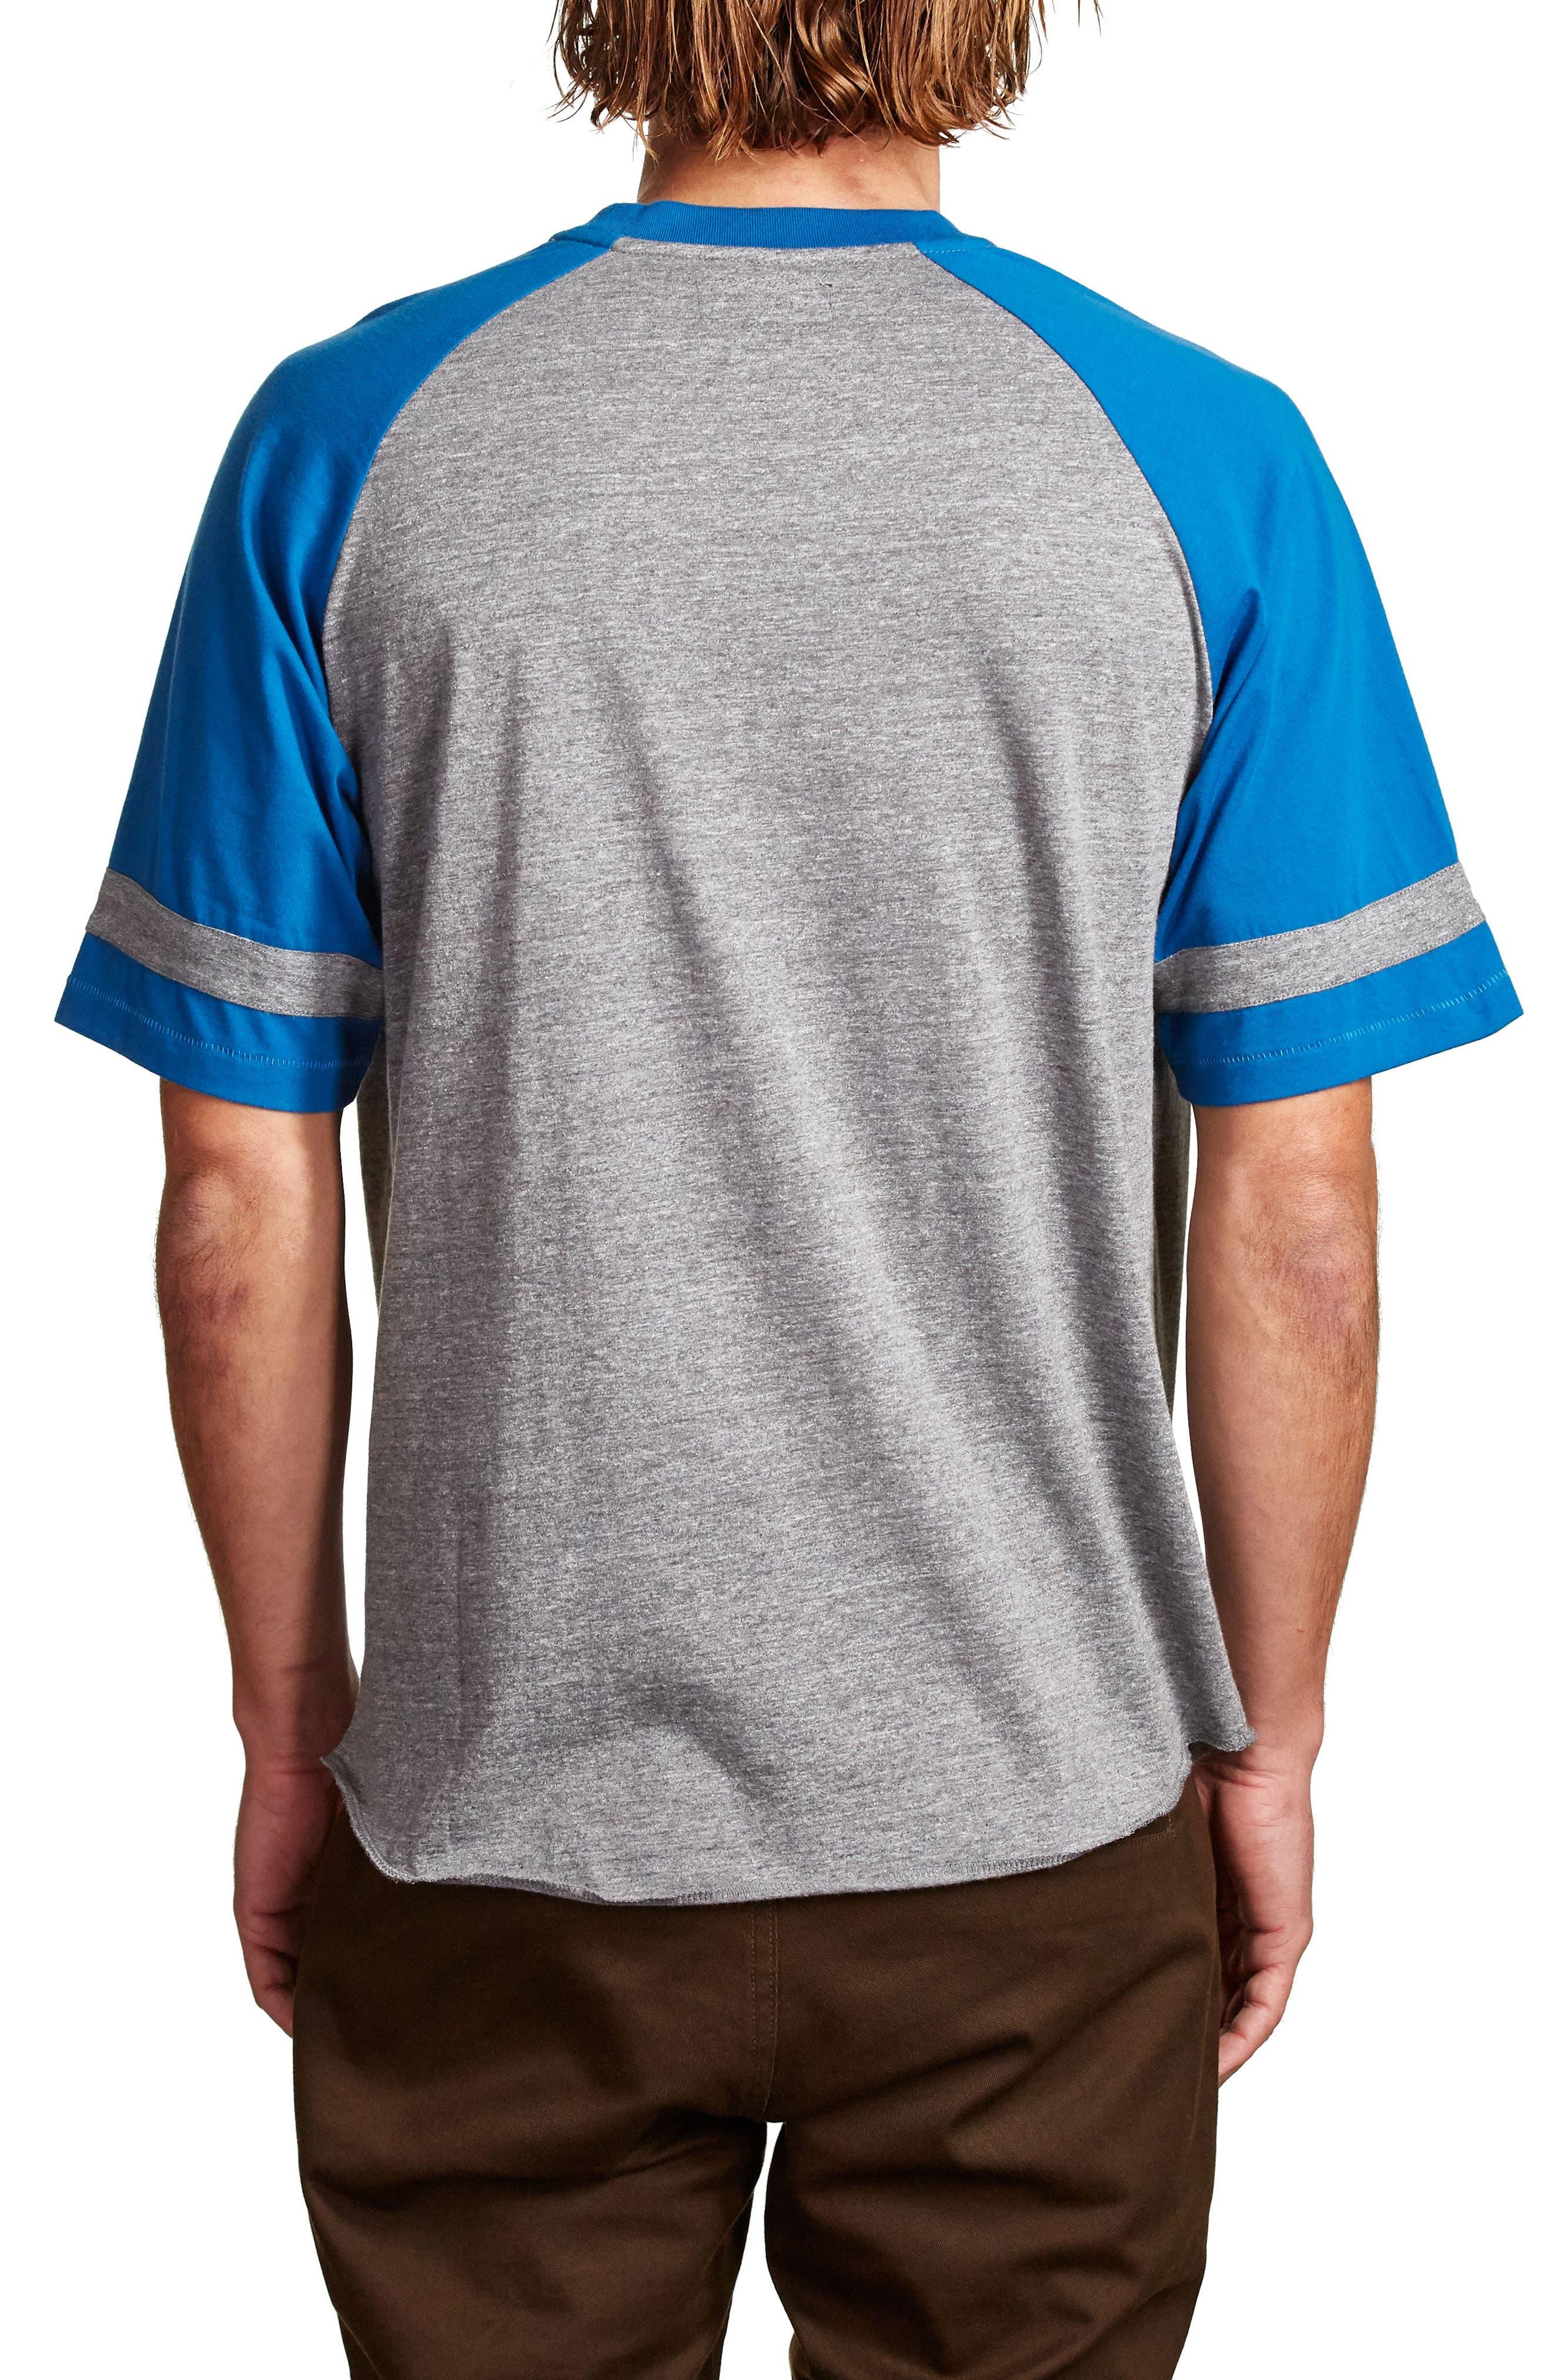 Rockford Baseball T-Shirt,                             Alternate thumbnail 2, color,                             Heather Grey/ Royal